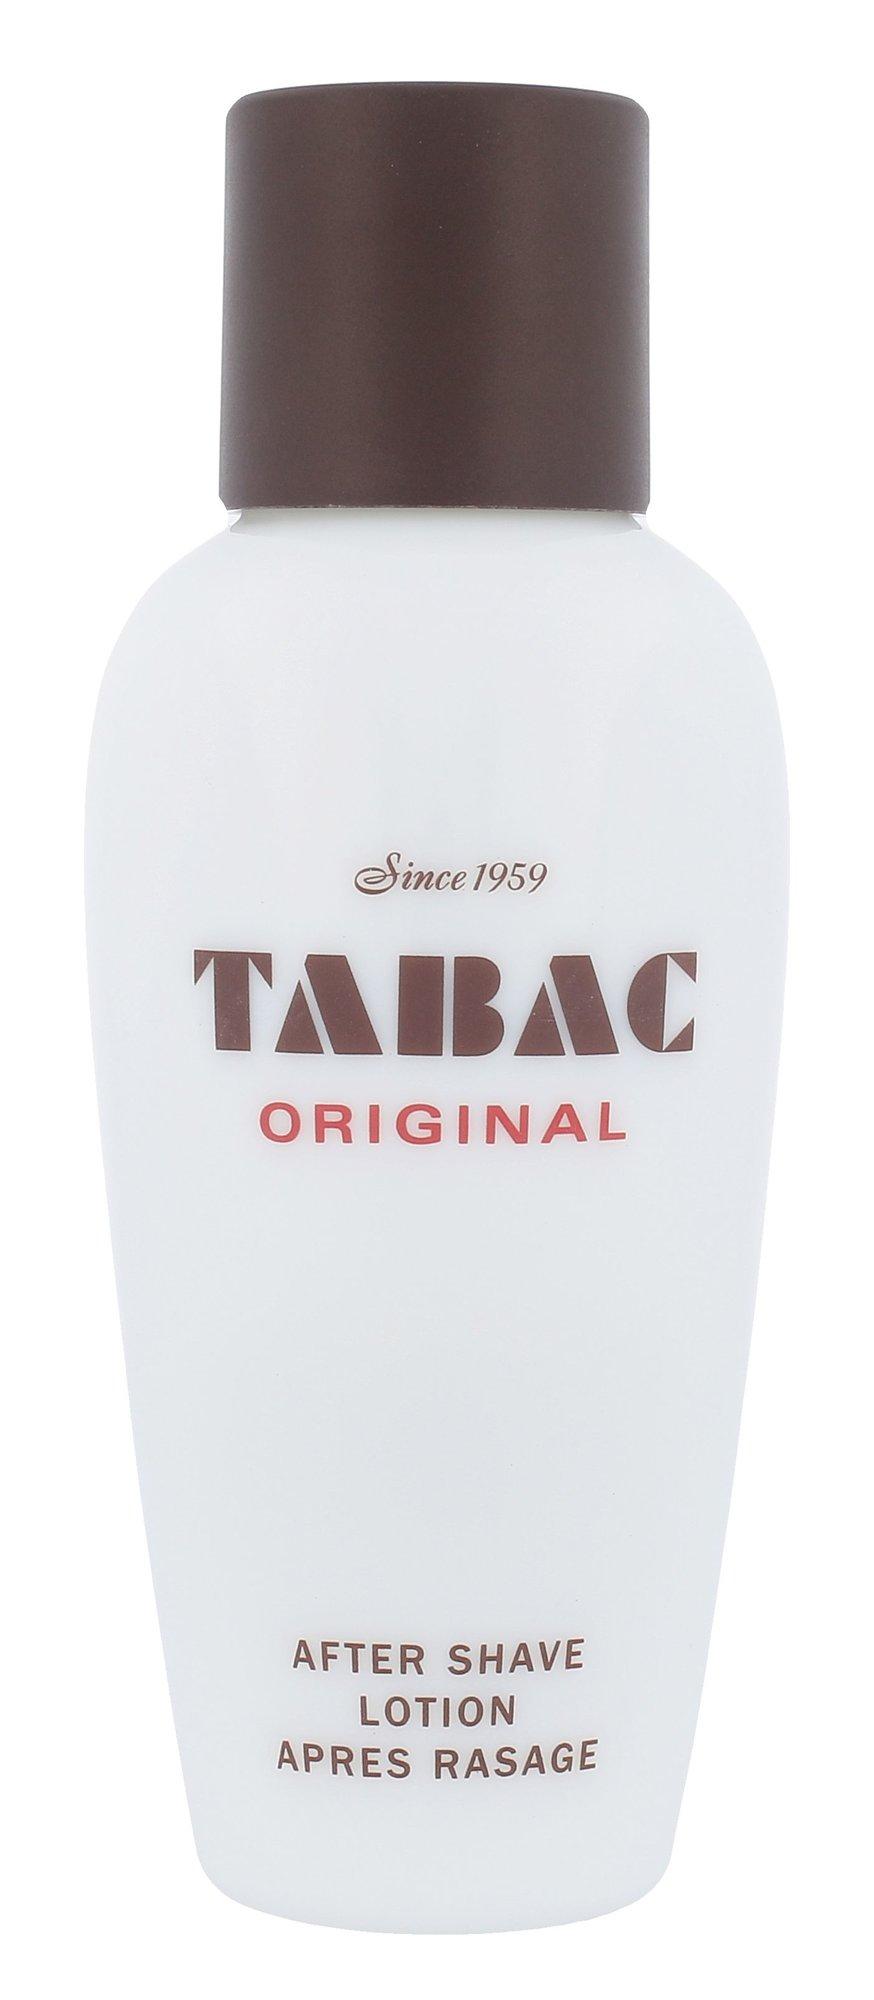 Tabac Original Aftershave 200ml